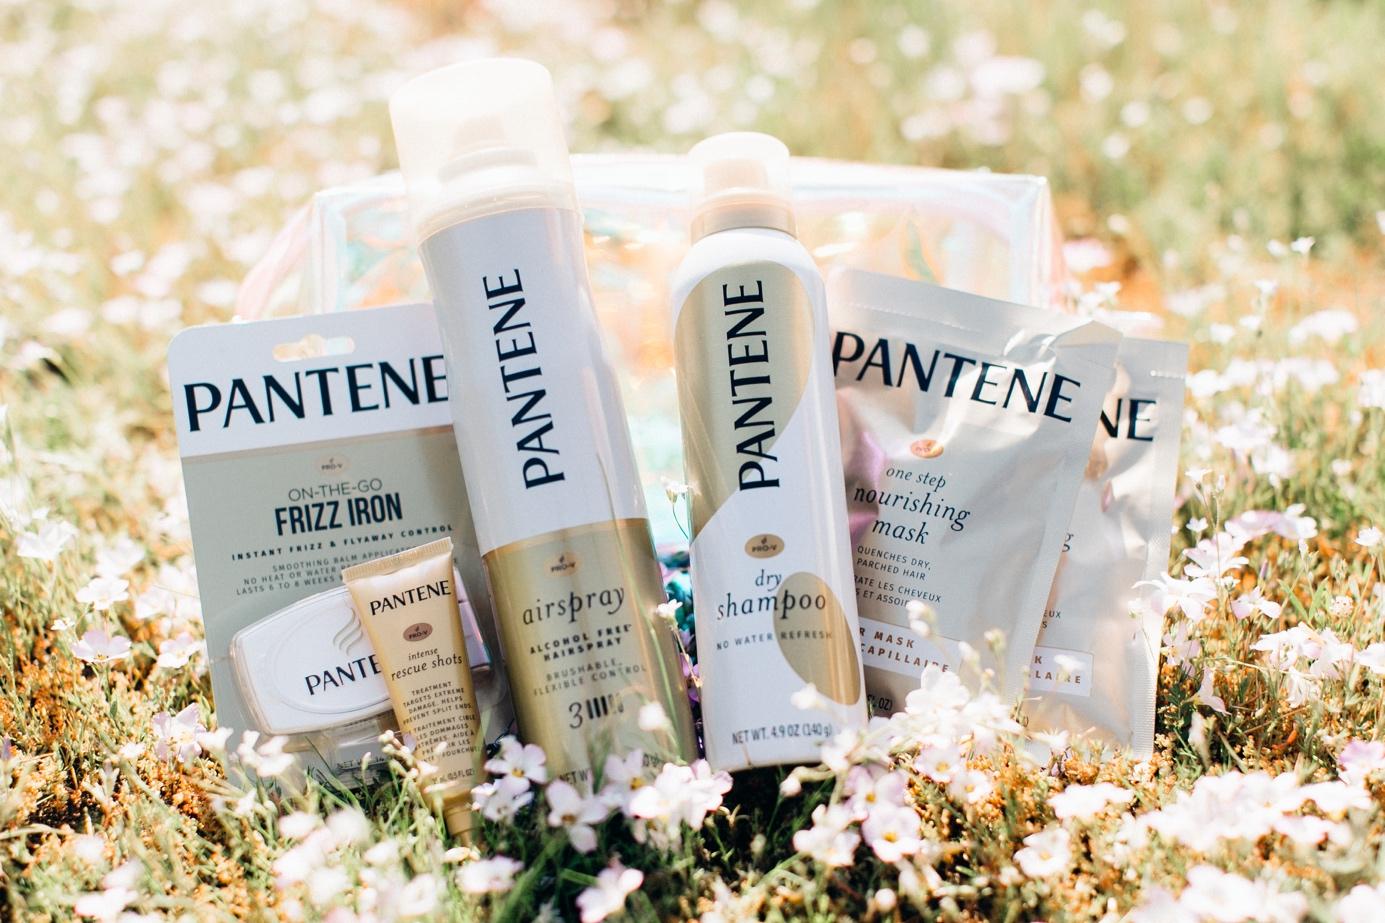 04_Pantene-3.jpg